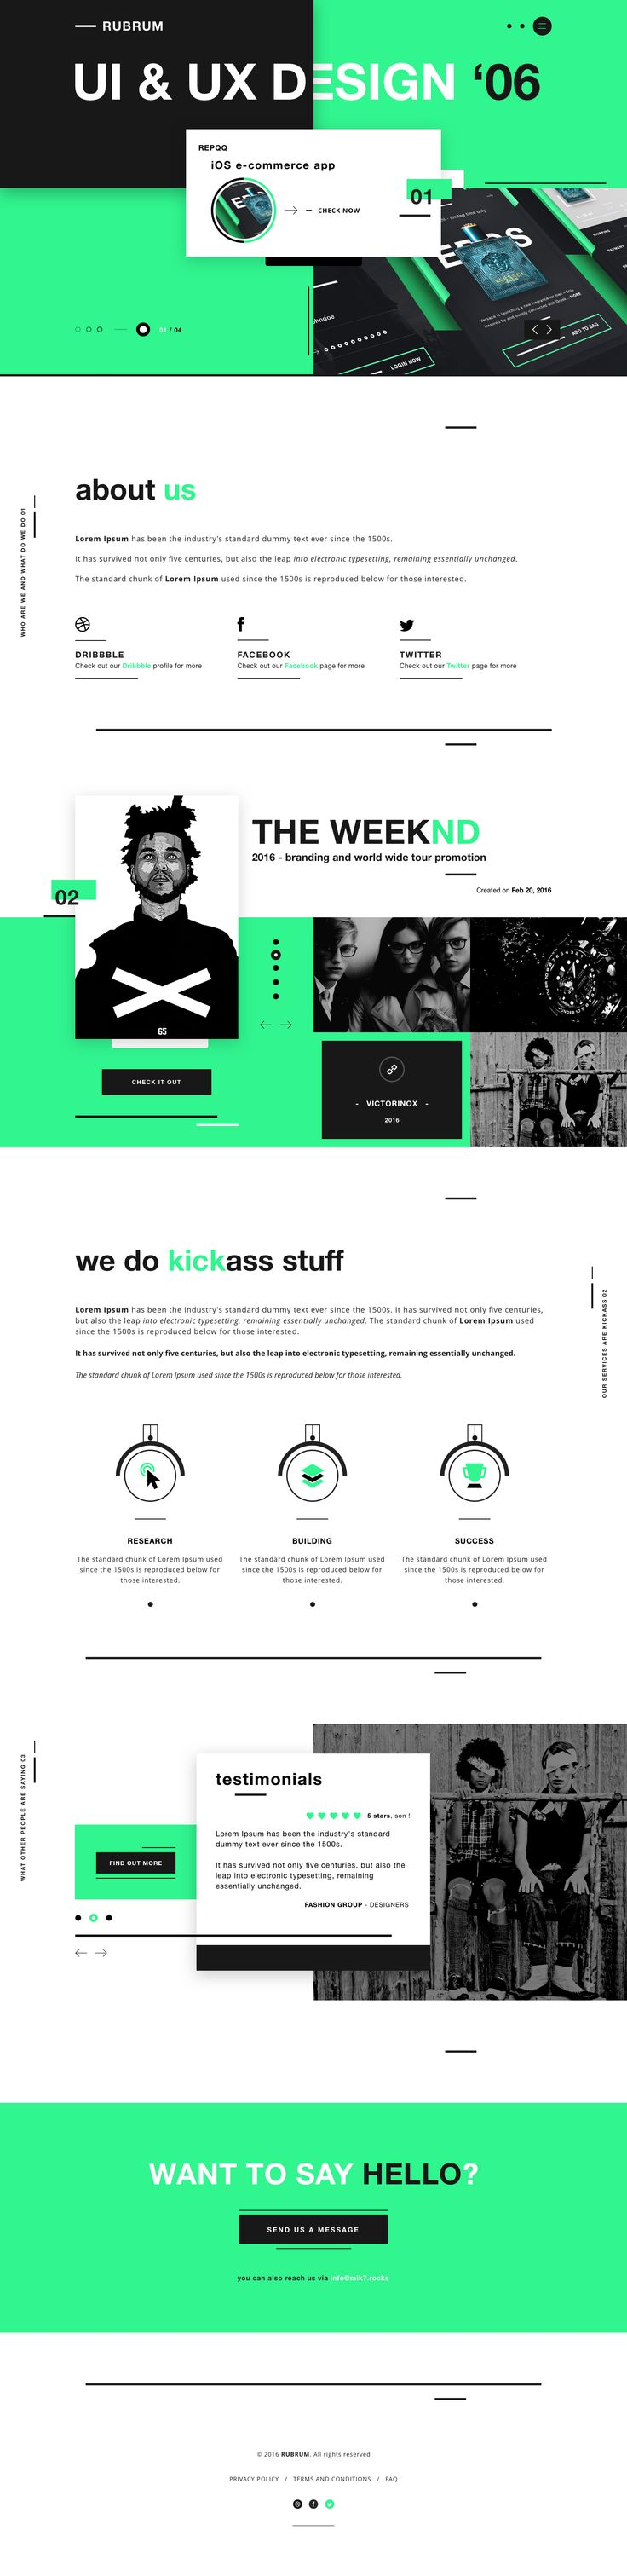 Rubrum website design ui agency dribbble robert berki